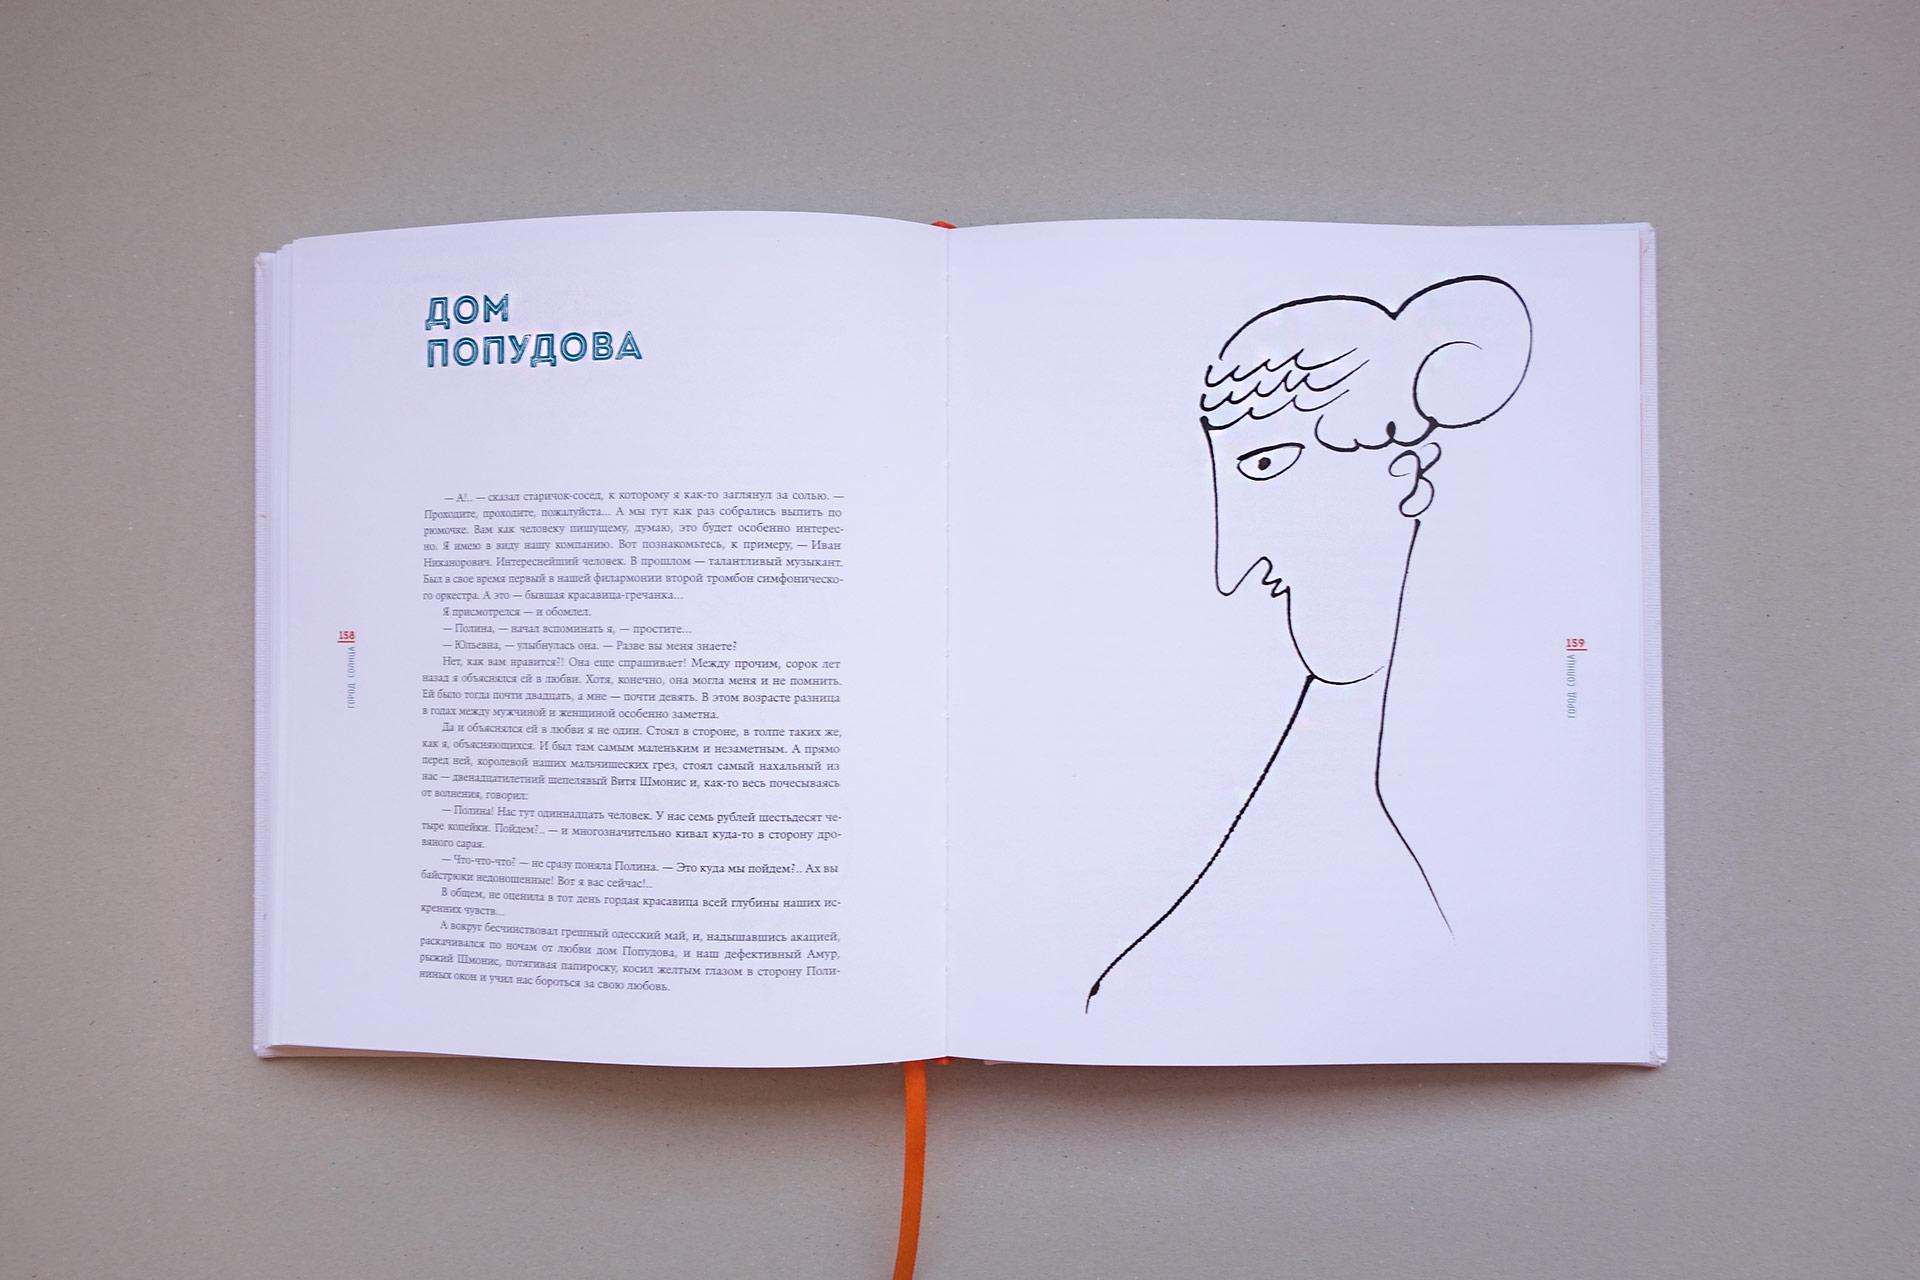 Asgard Branding, design, print, printed publications, book design, George Golubenko, Michael Reva, illustrations